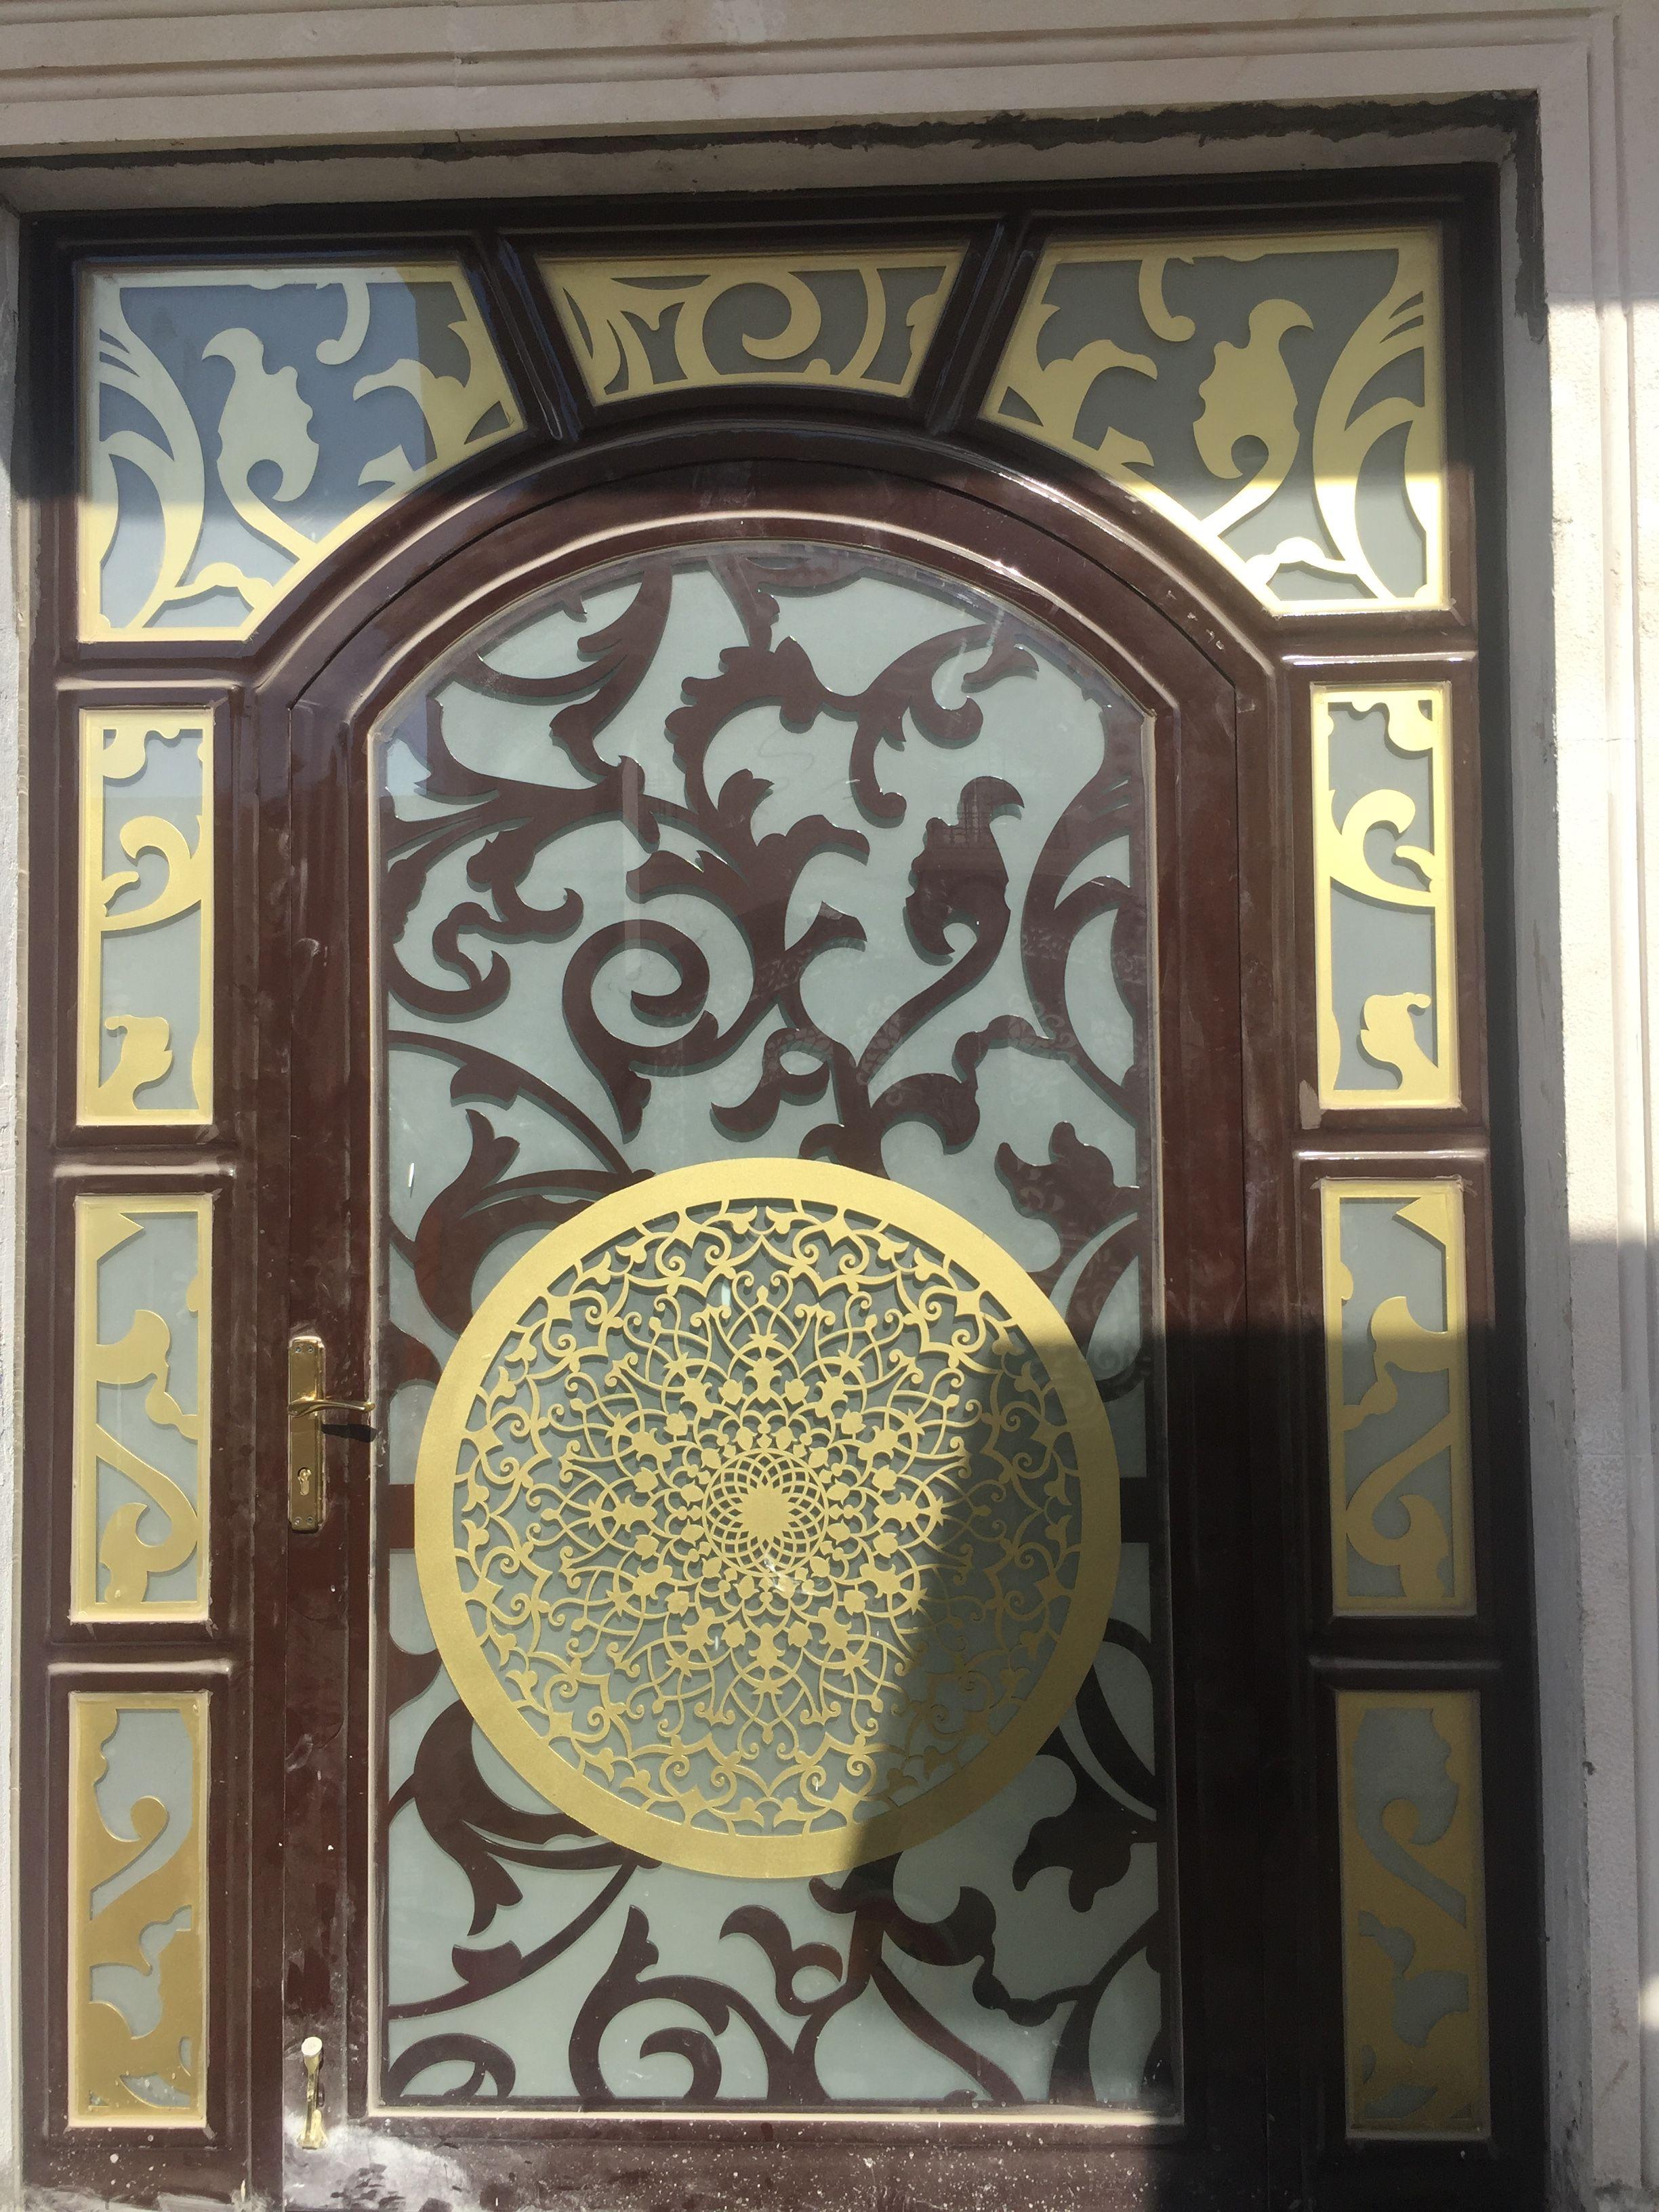 Pin By ابواب درج حديد القصور الذهبية On ابواب داخلية Decor Home Decor Mirror